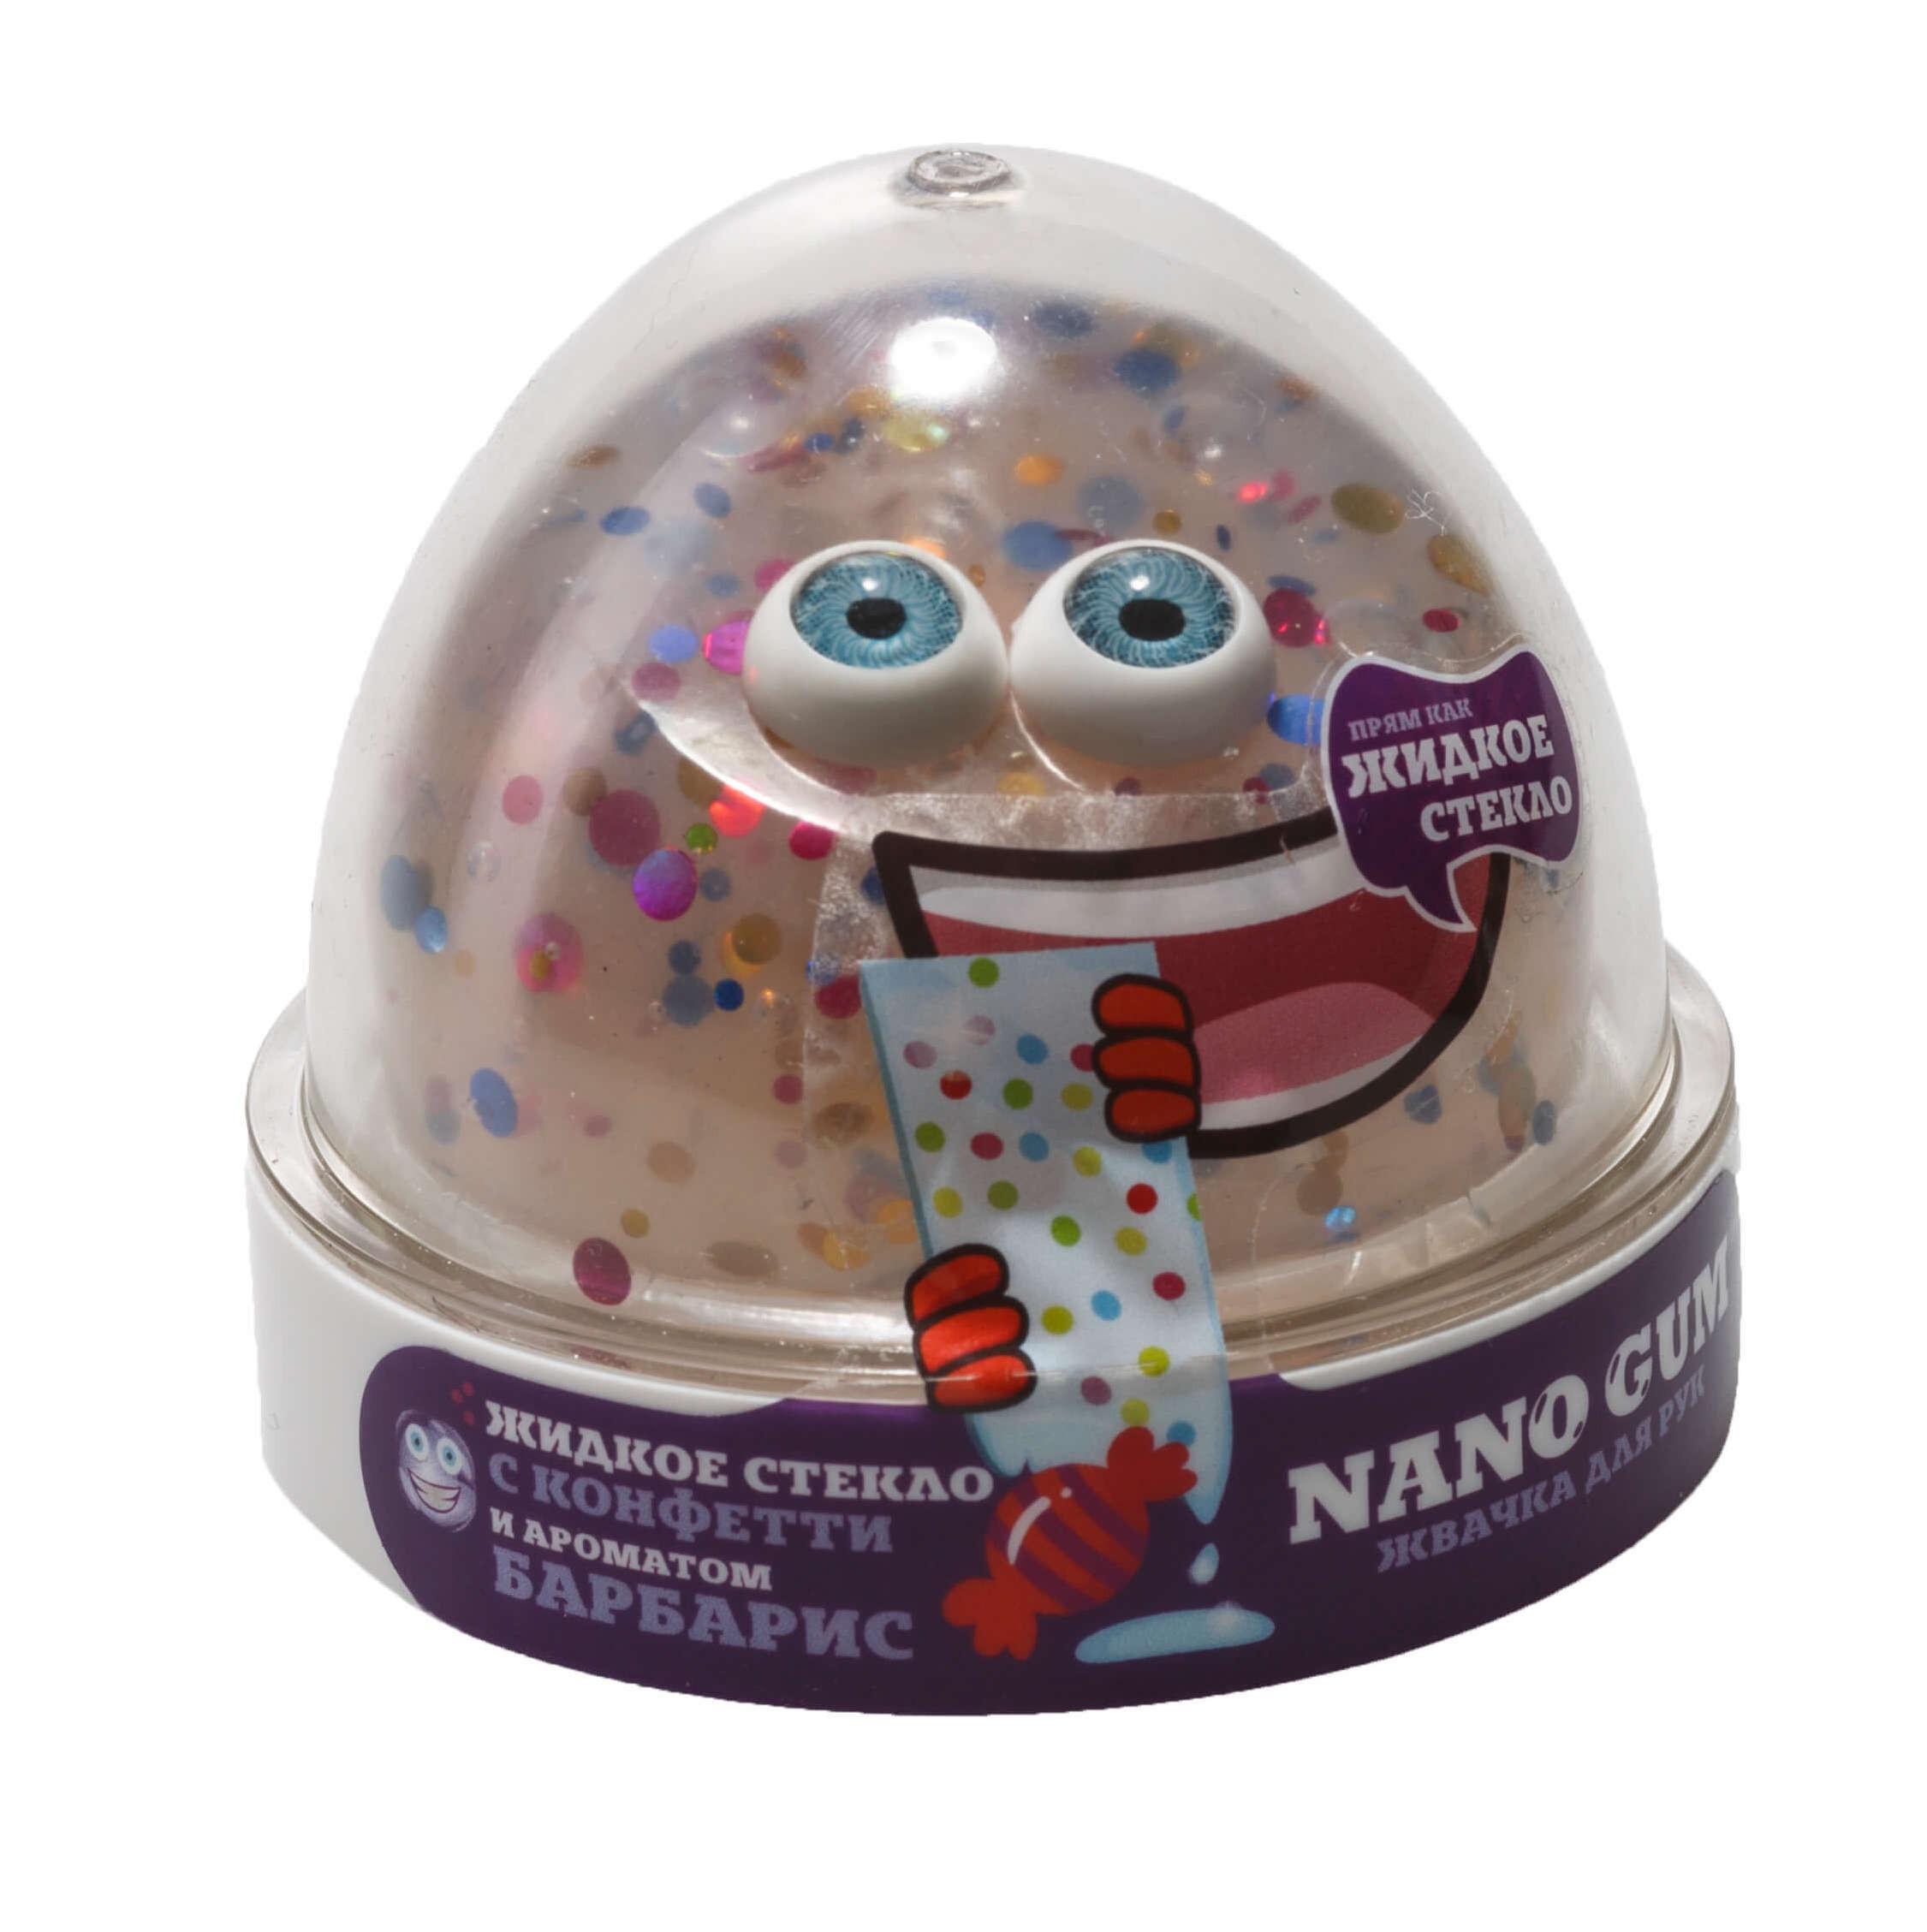 Nano gum, Жидкое стекло с конфети с ароматом Барбариса